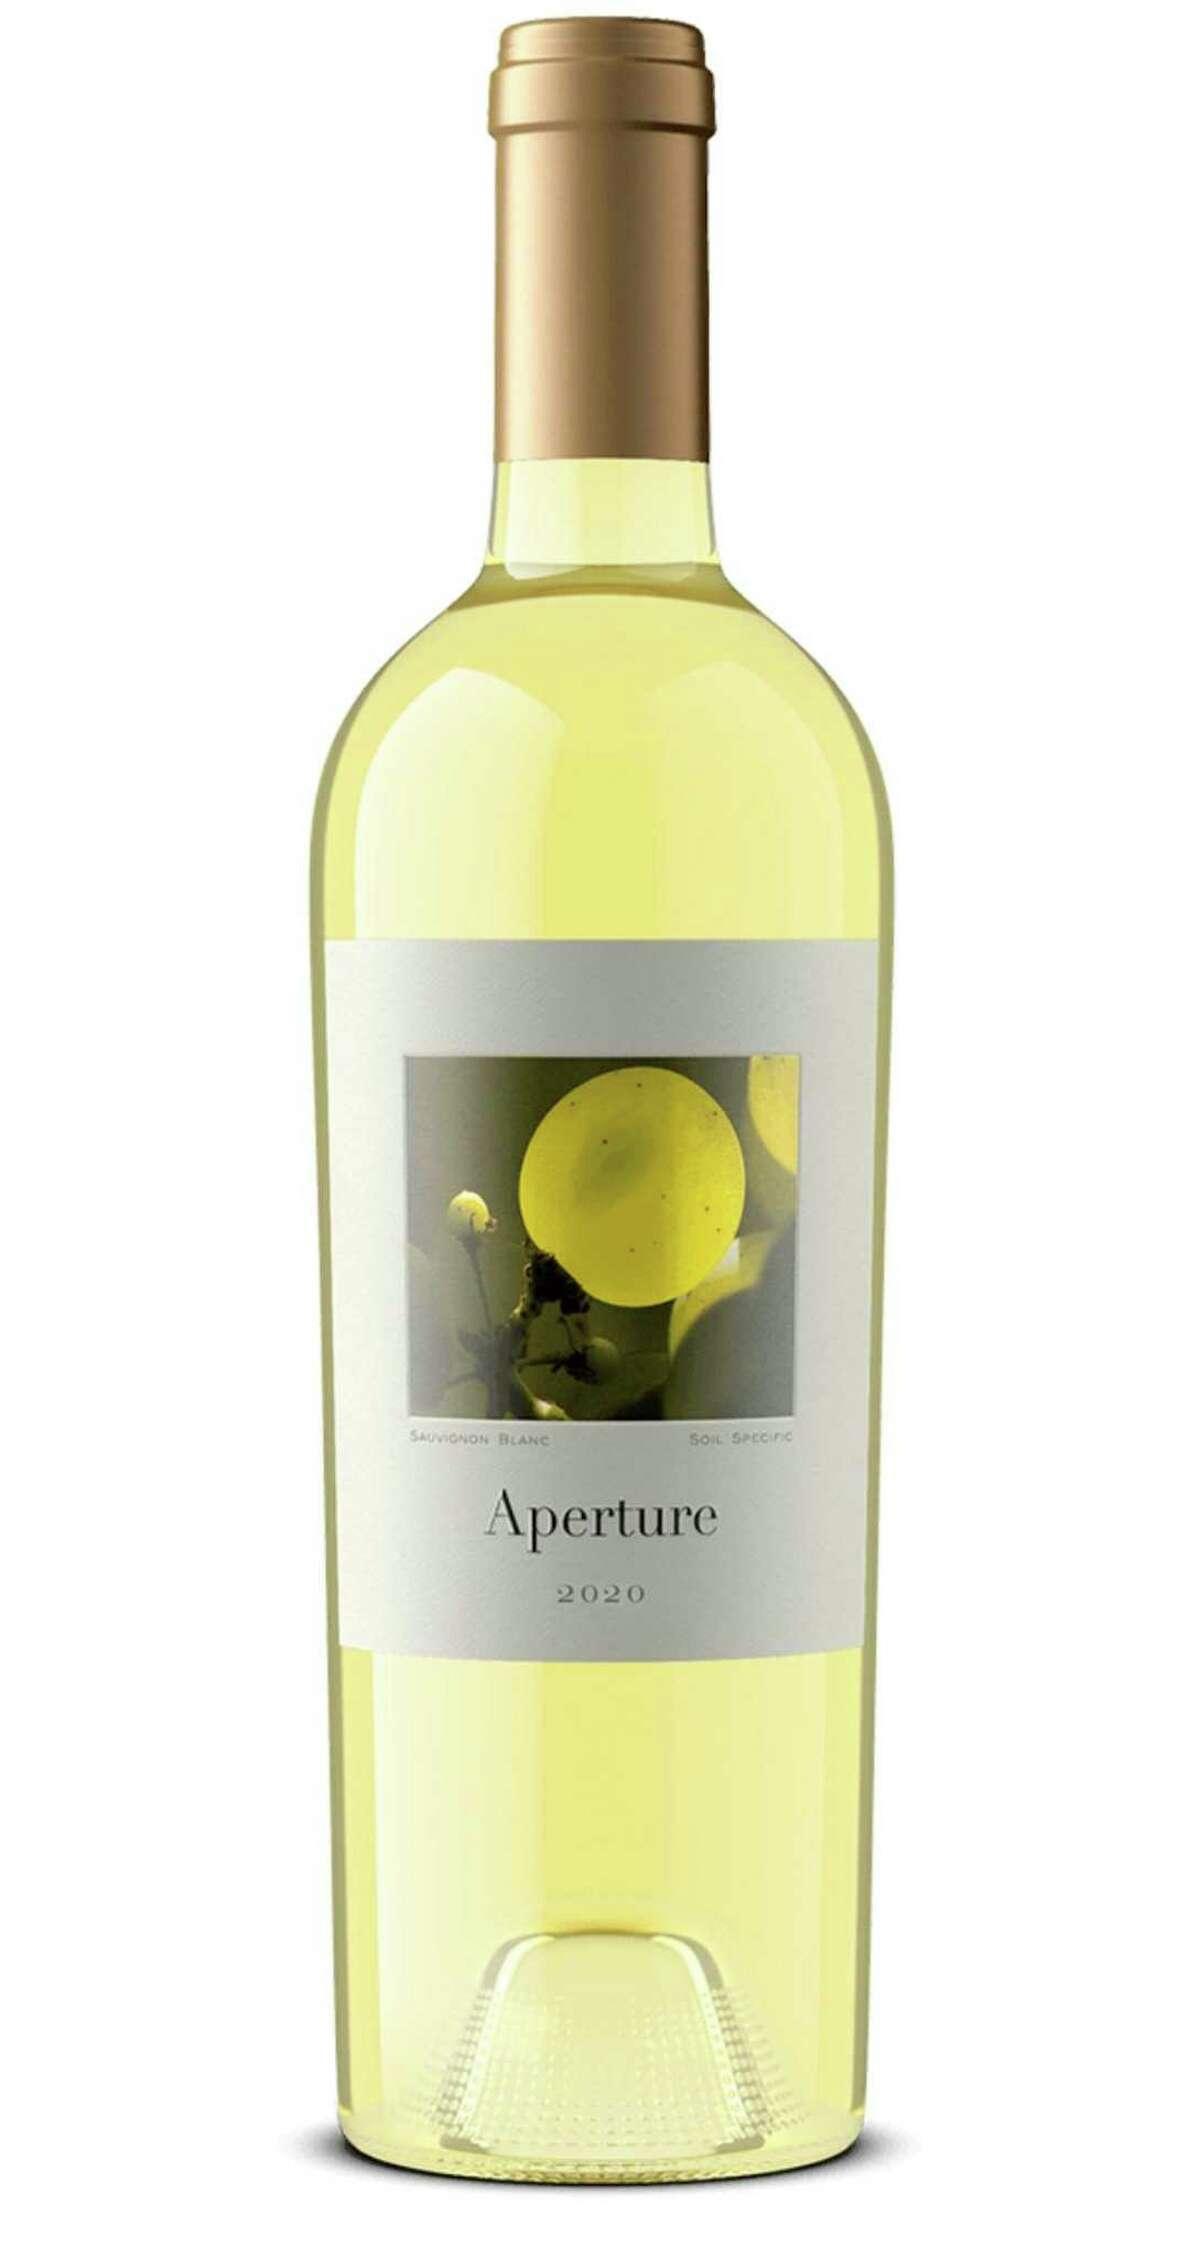 2020 Aperture Sauvignon Blanc